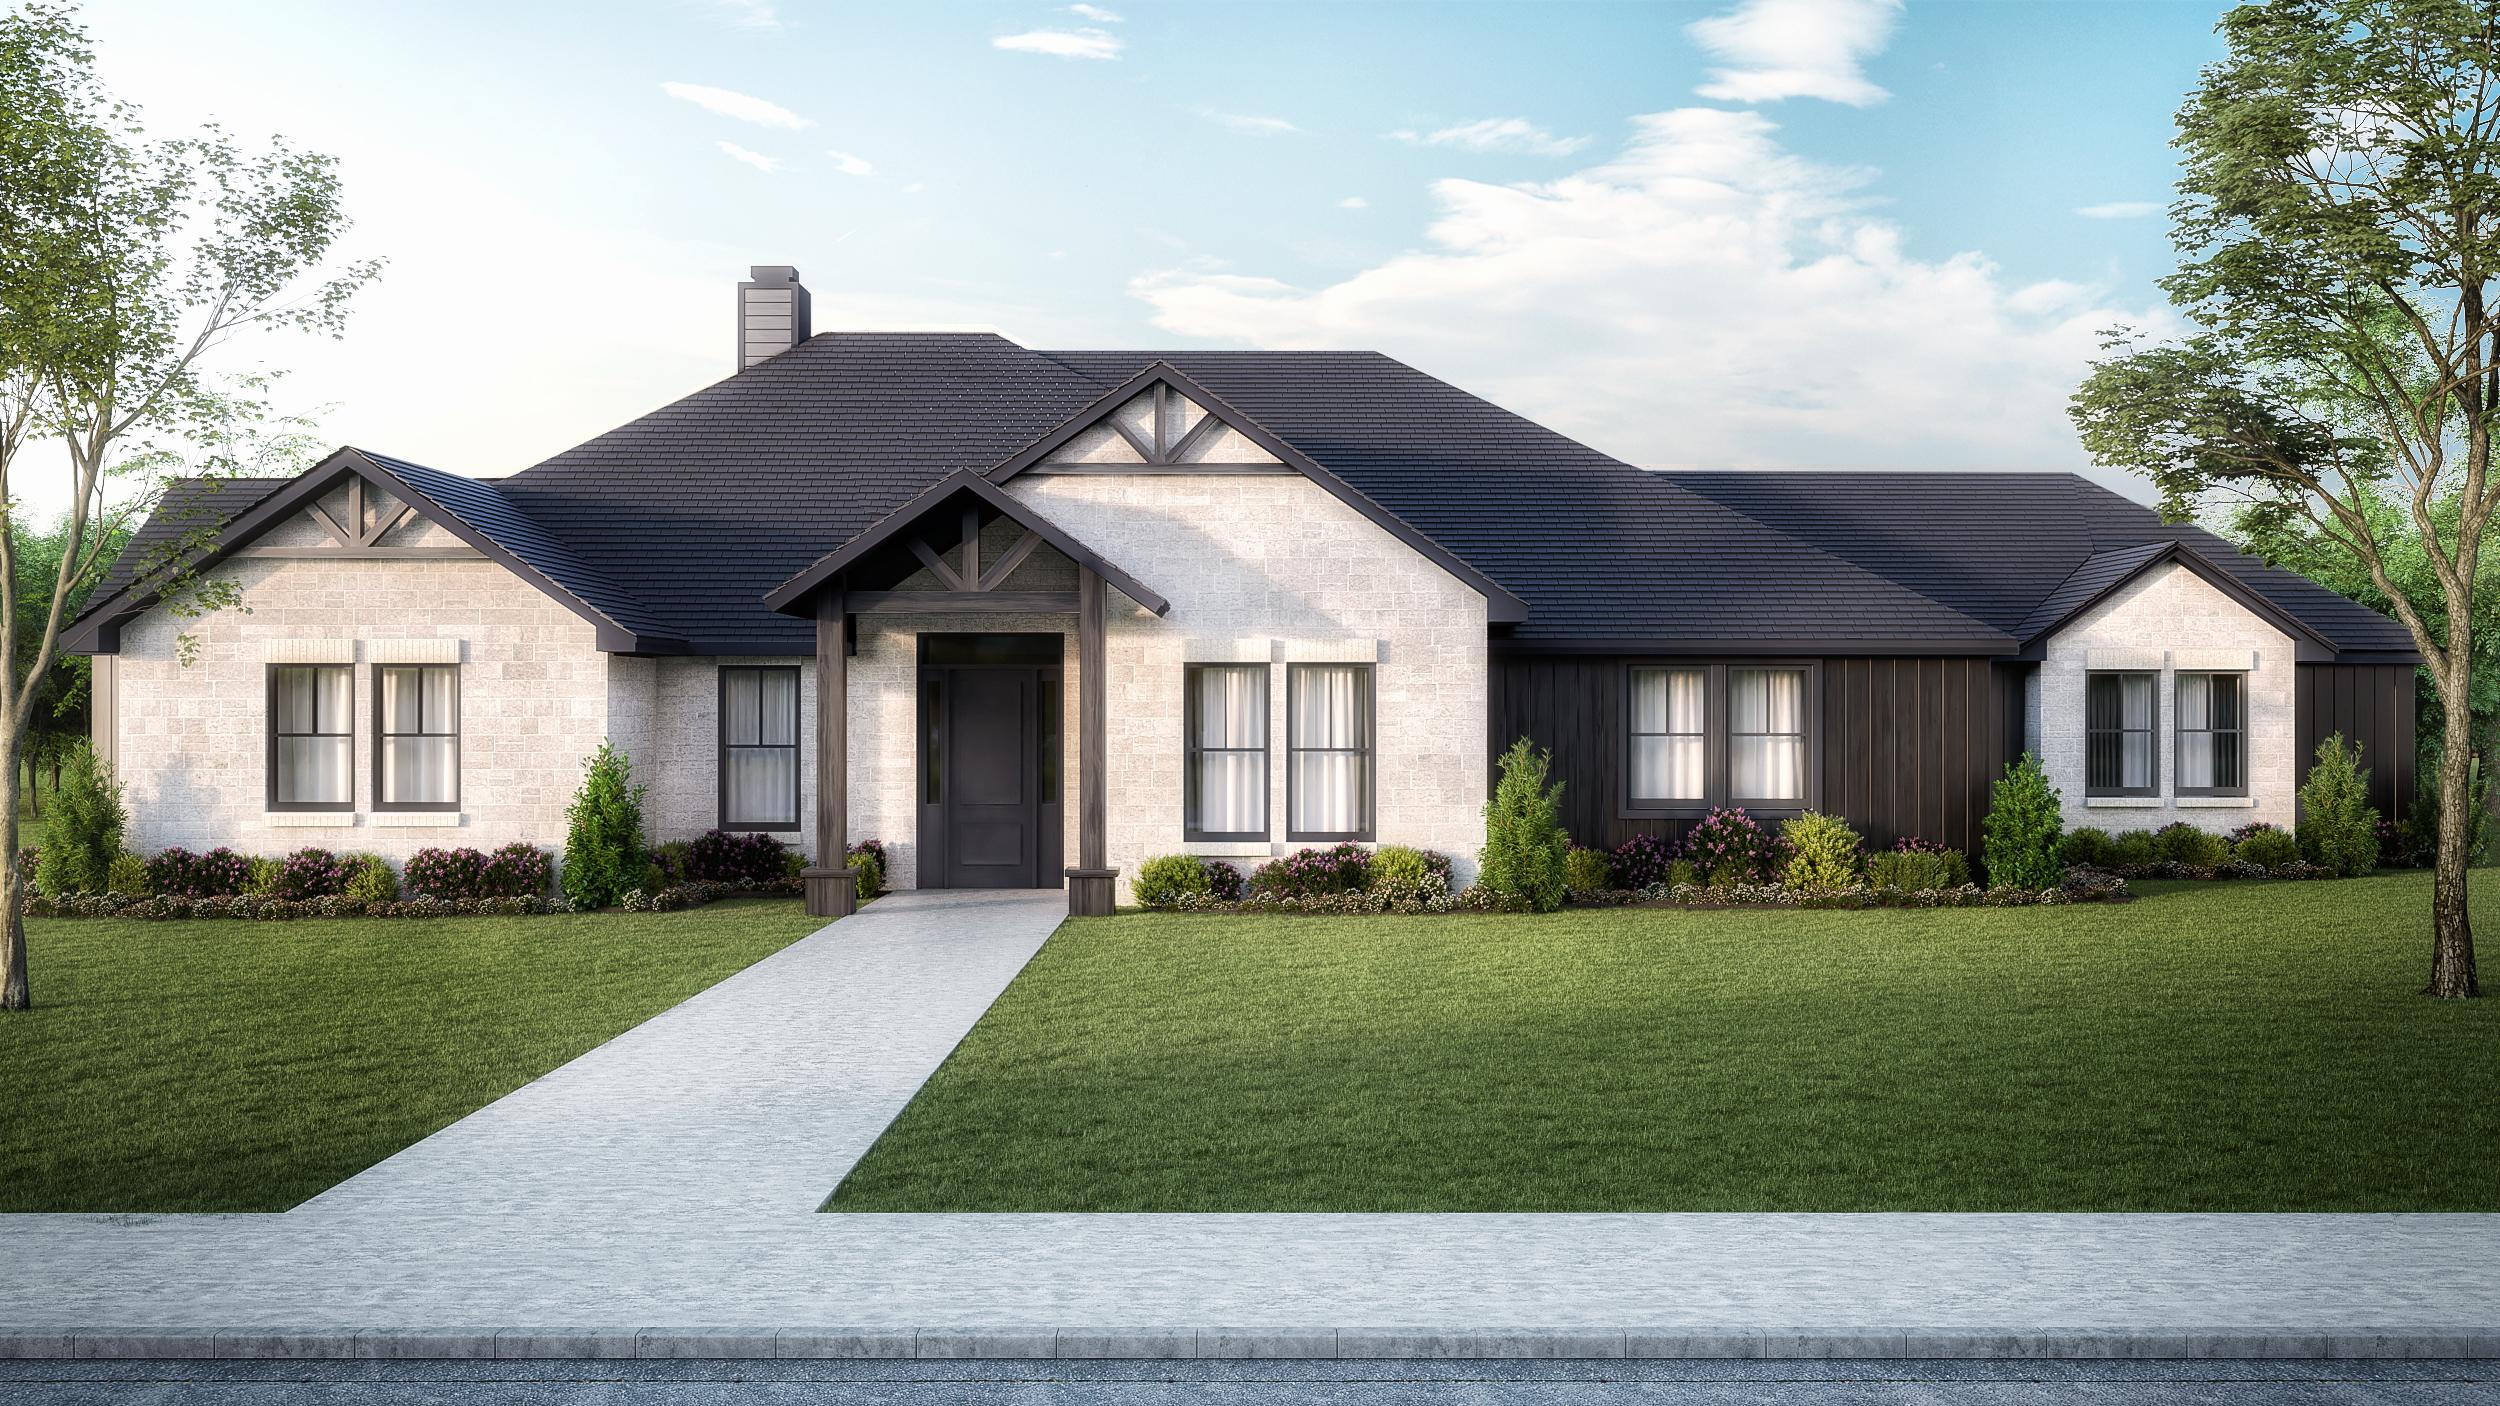 The Sabine   $359,450  3 Bedrooms, 2 Bathrooms  2,458 sq.ft.